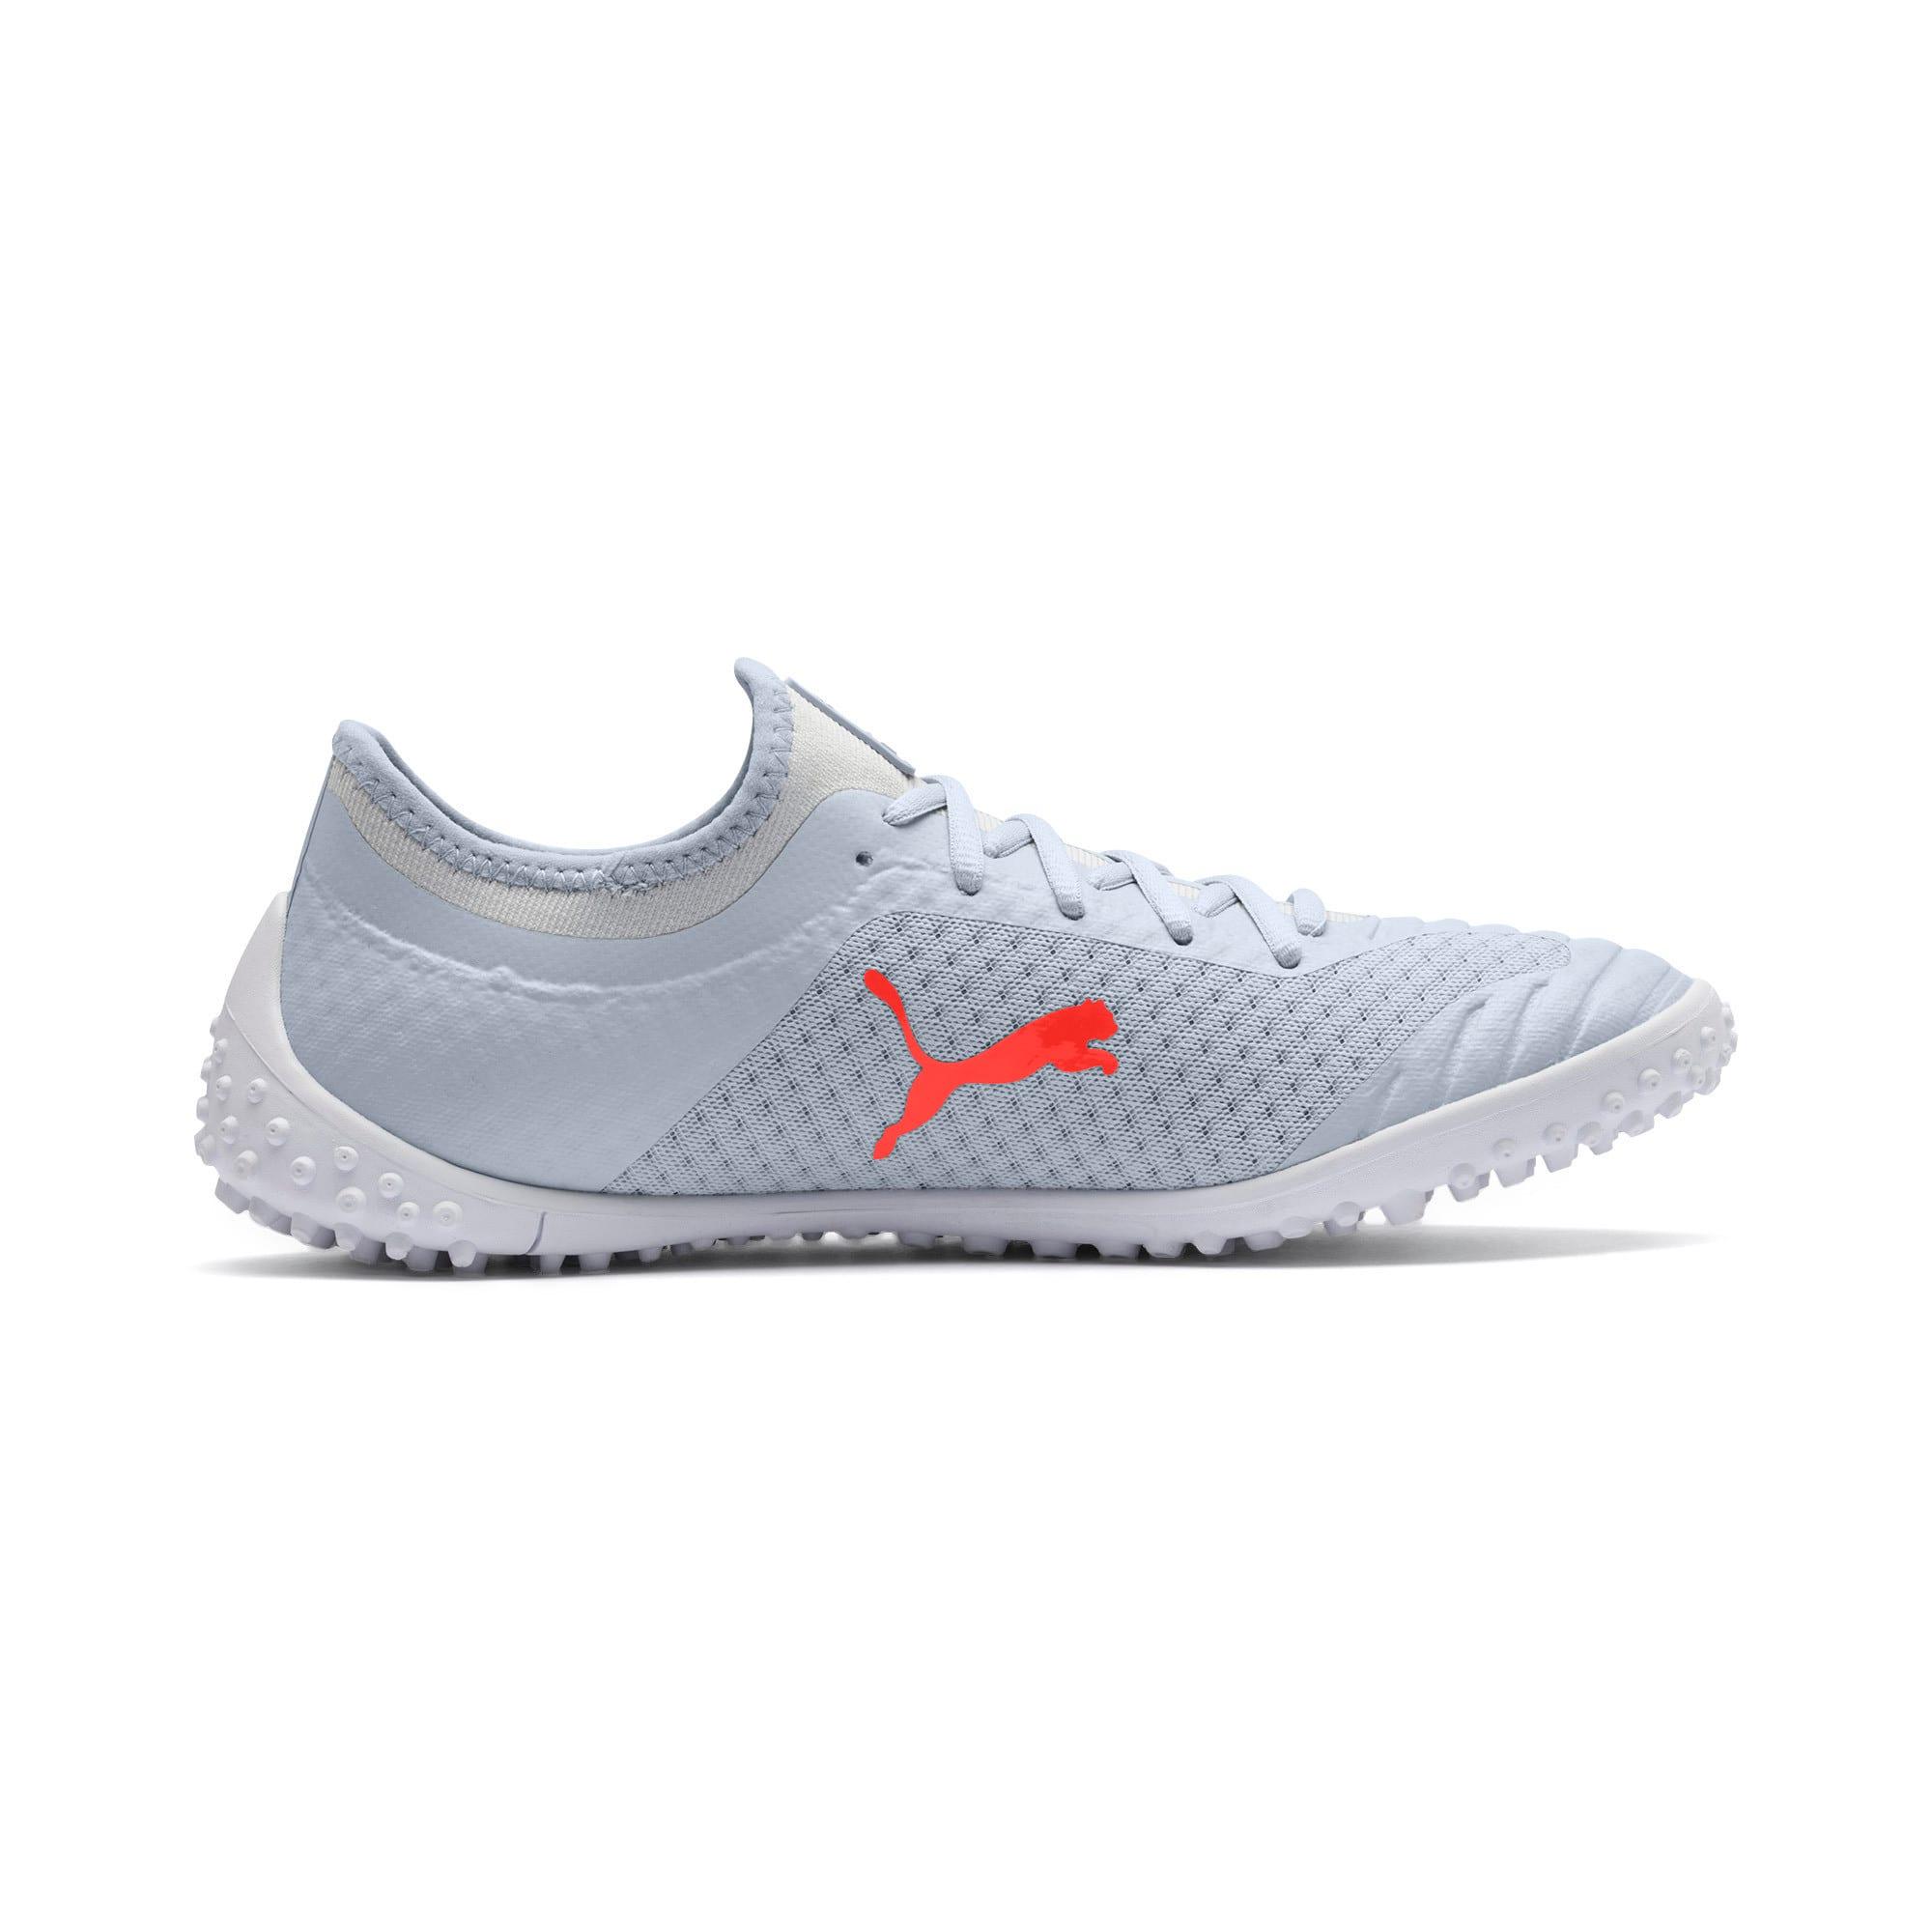 Thumbnail 6 of 365 Concrete 2 ST Men's Soccer Shoes, Grey Dawn-Nrgy Red-White, medium